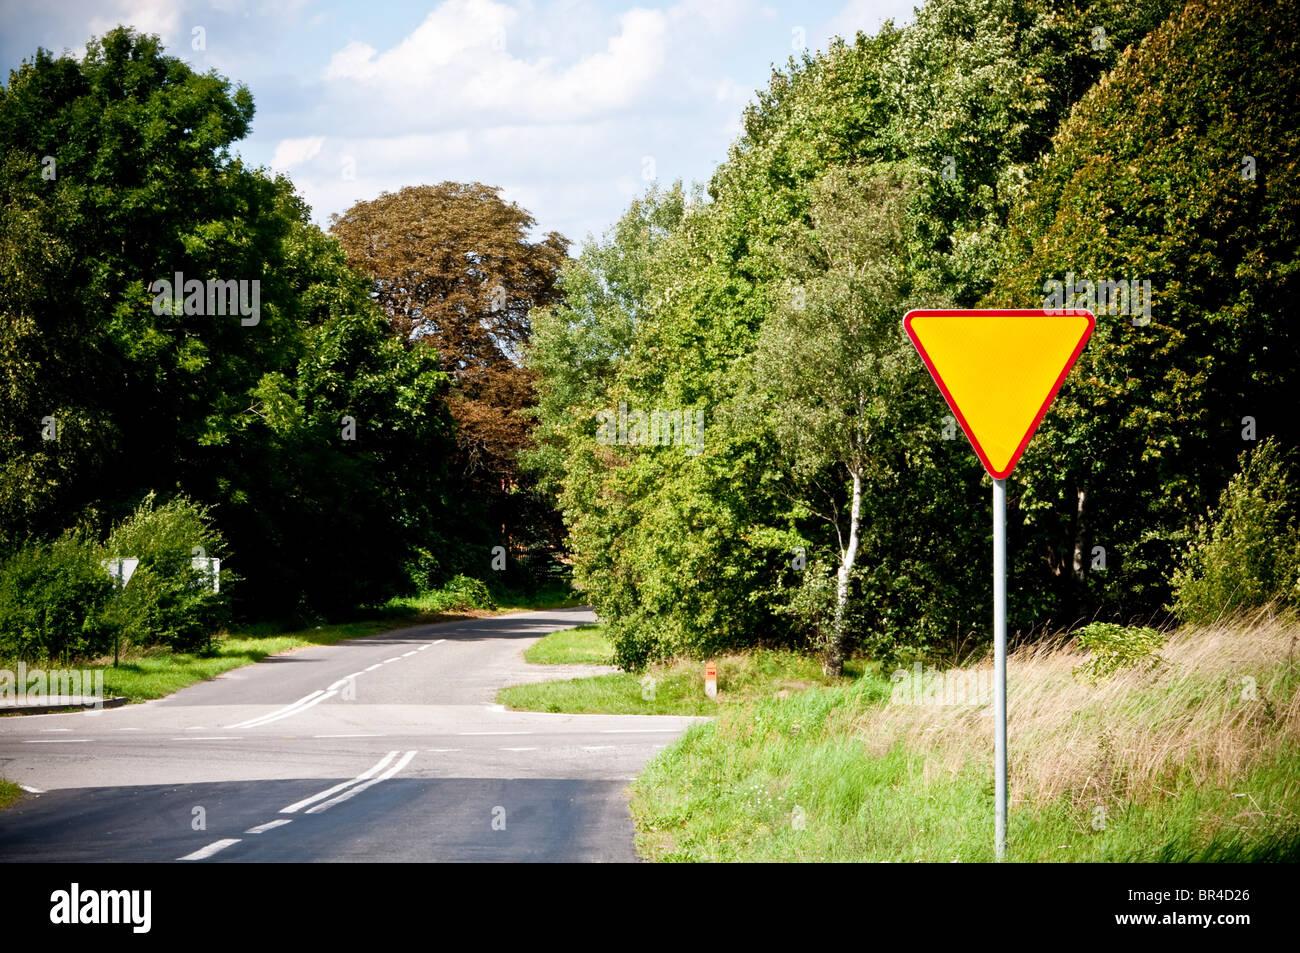 yield sign near crossroad - Stock Image